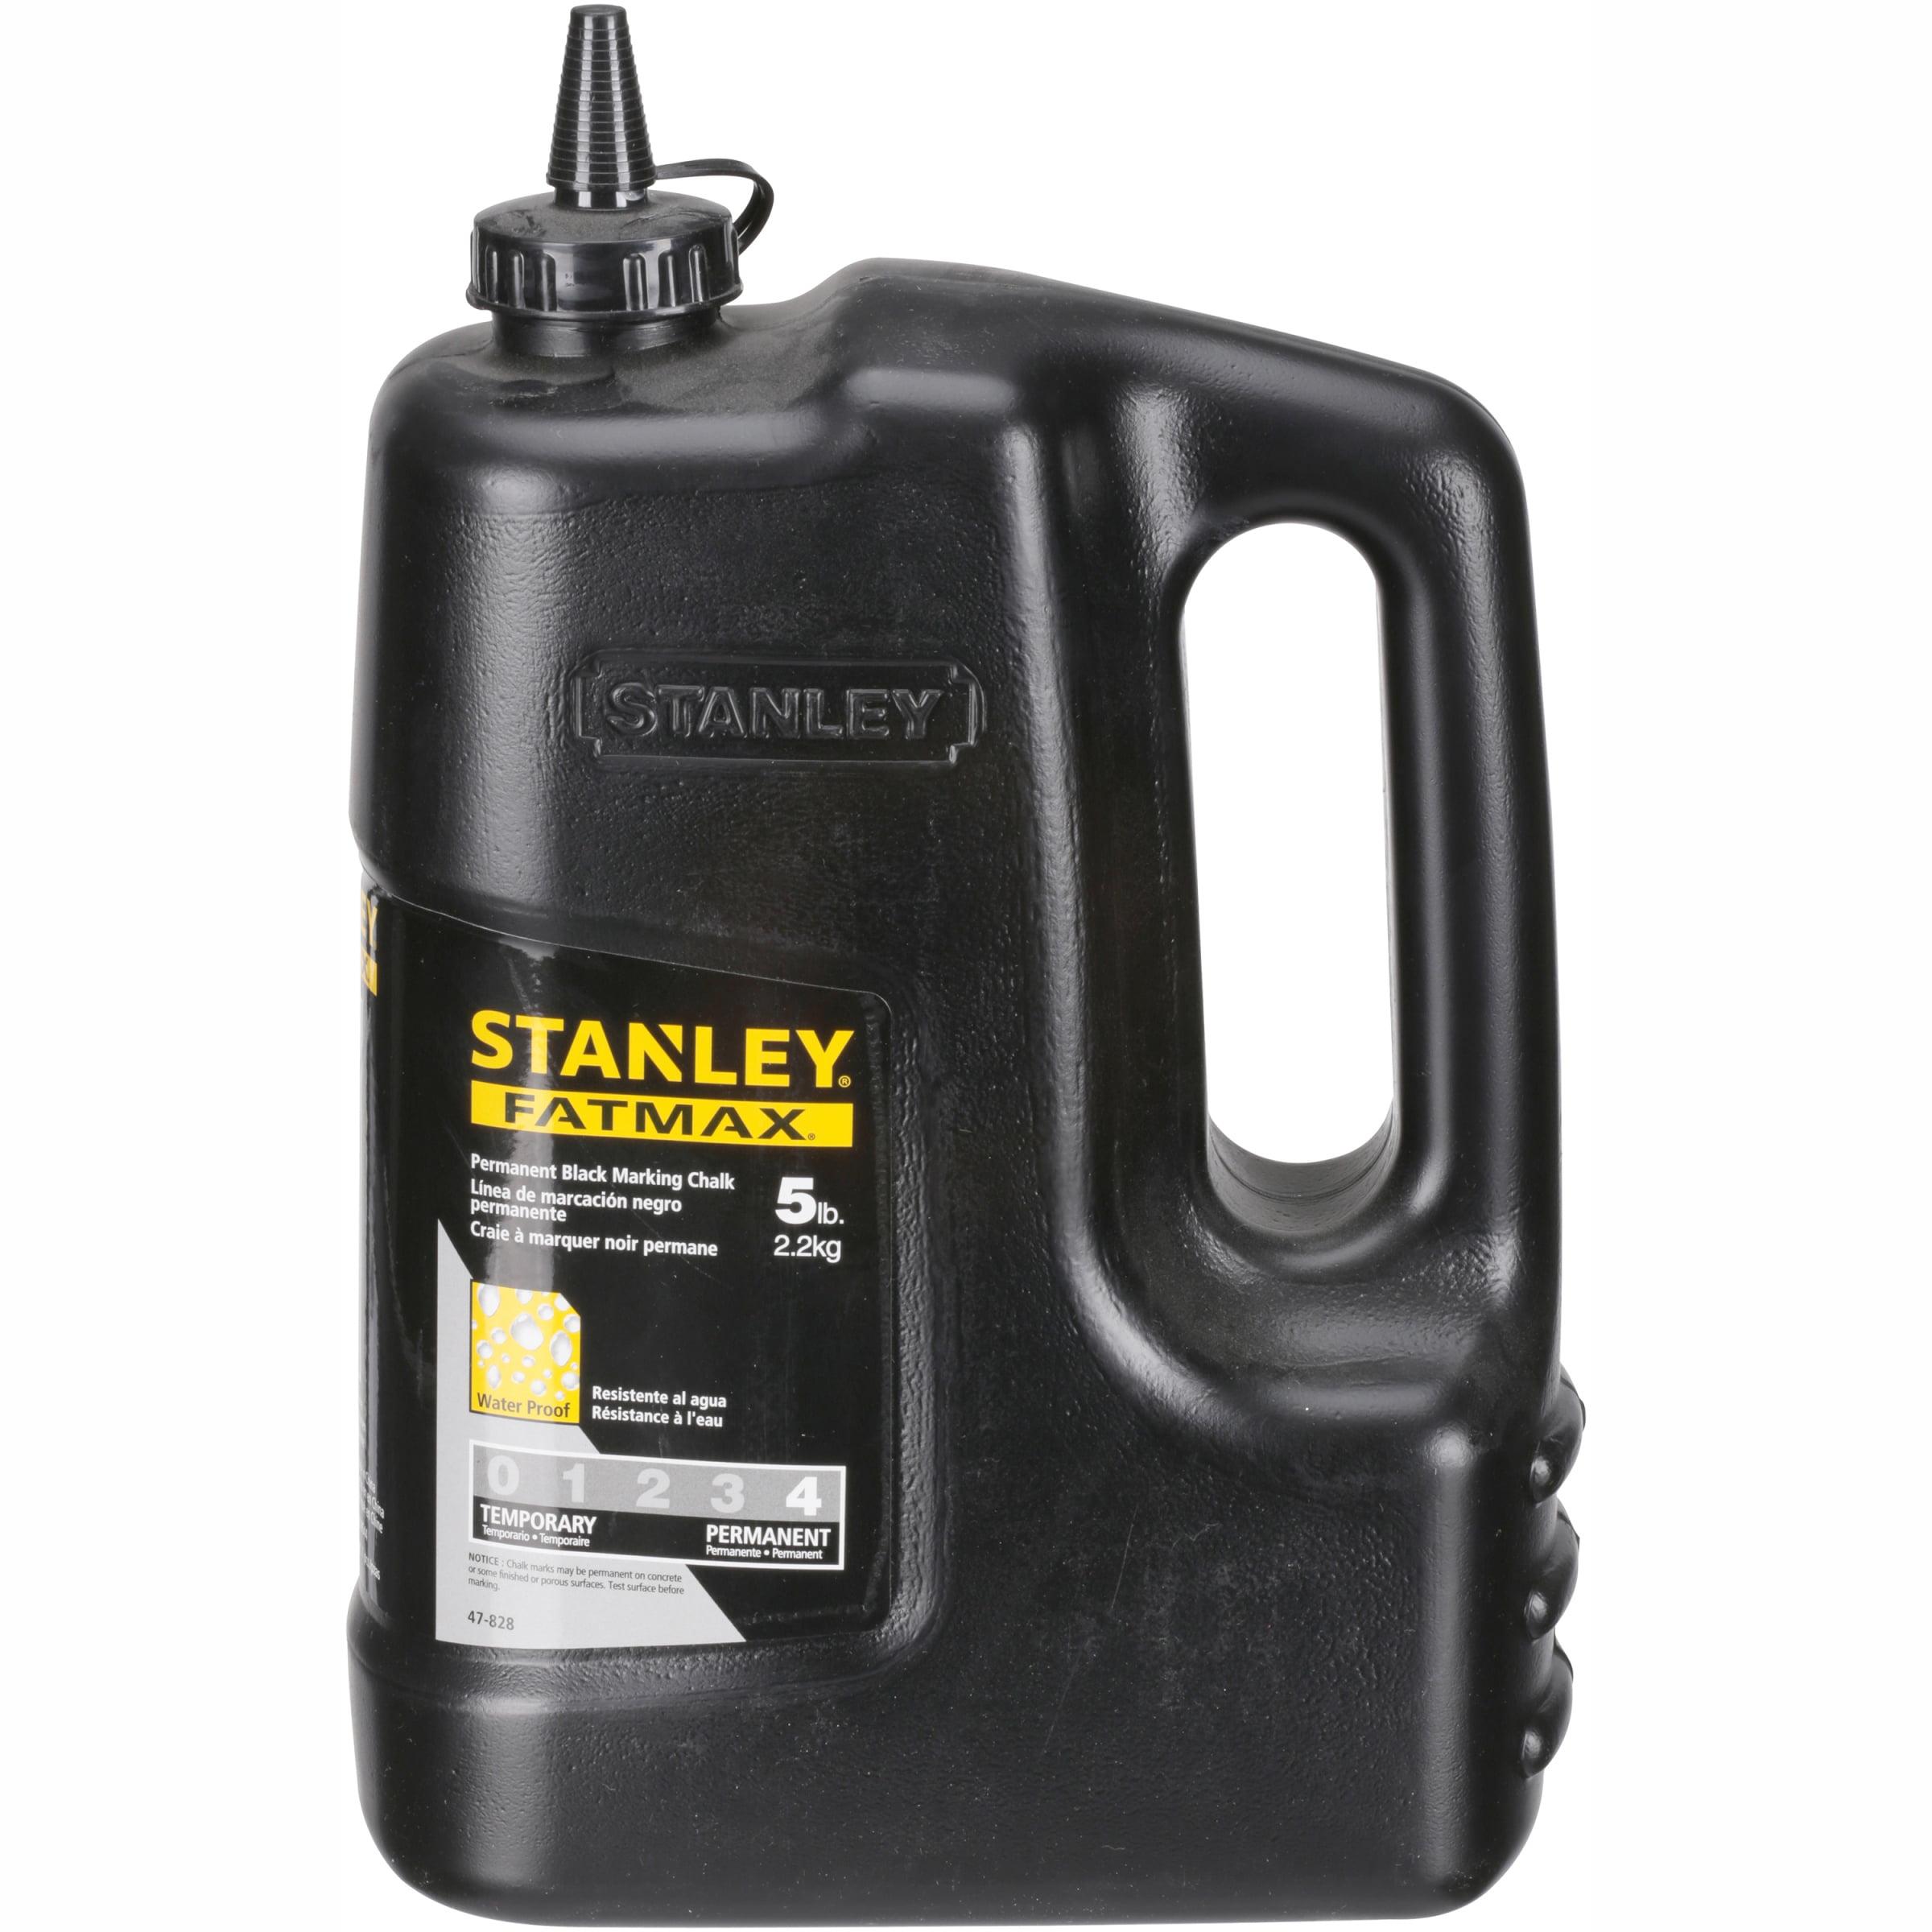 Stanley® Fatmax® Permanent Black Marking Chalk 5 lb. Bottle